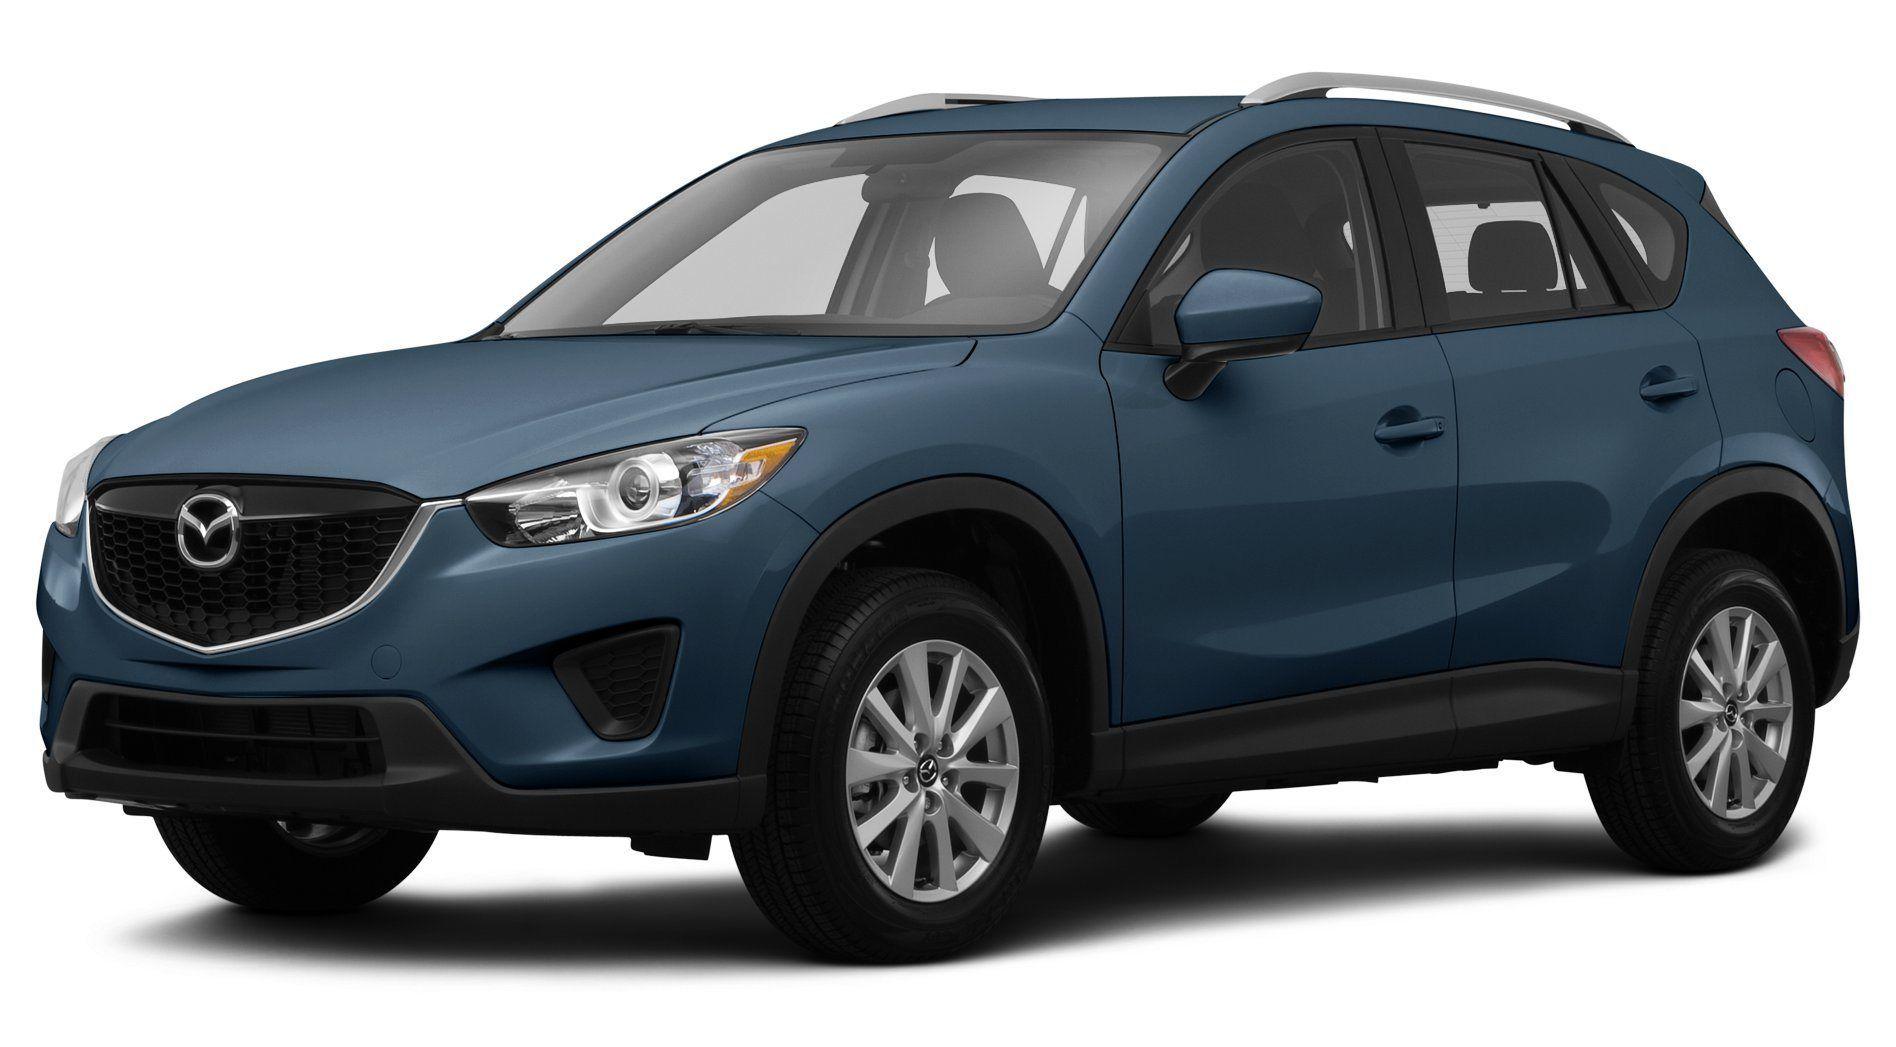 2021 Nissan Pathfinder Hybrid Pricing in 2020 Nissan